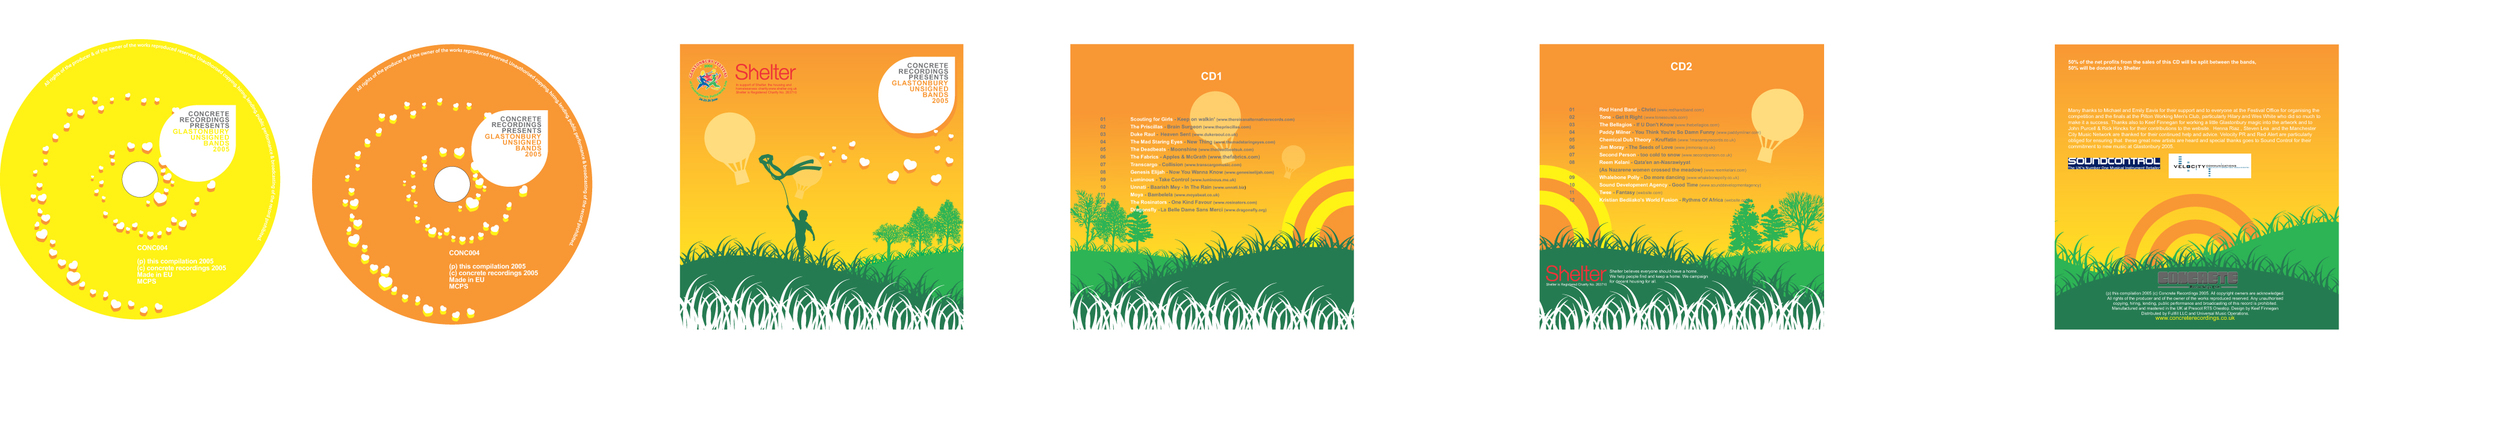 Glasto_05.4-grass.4.jpg